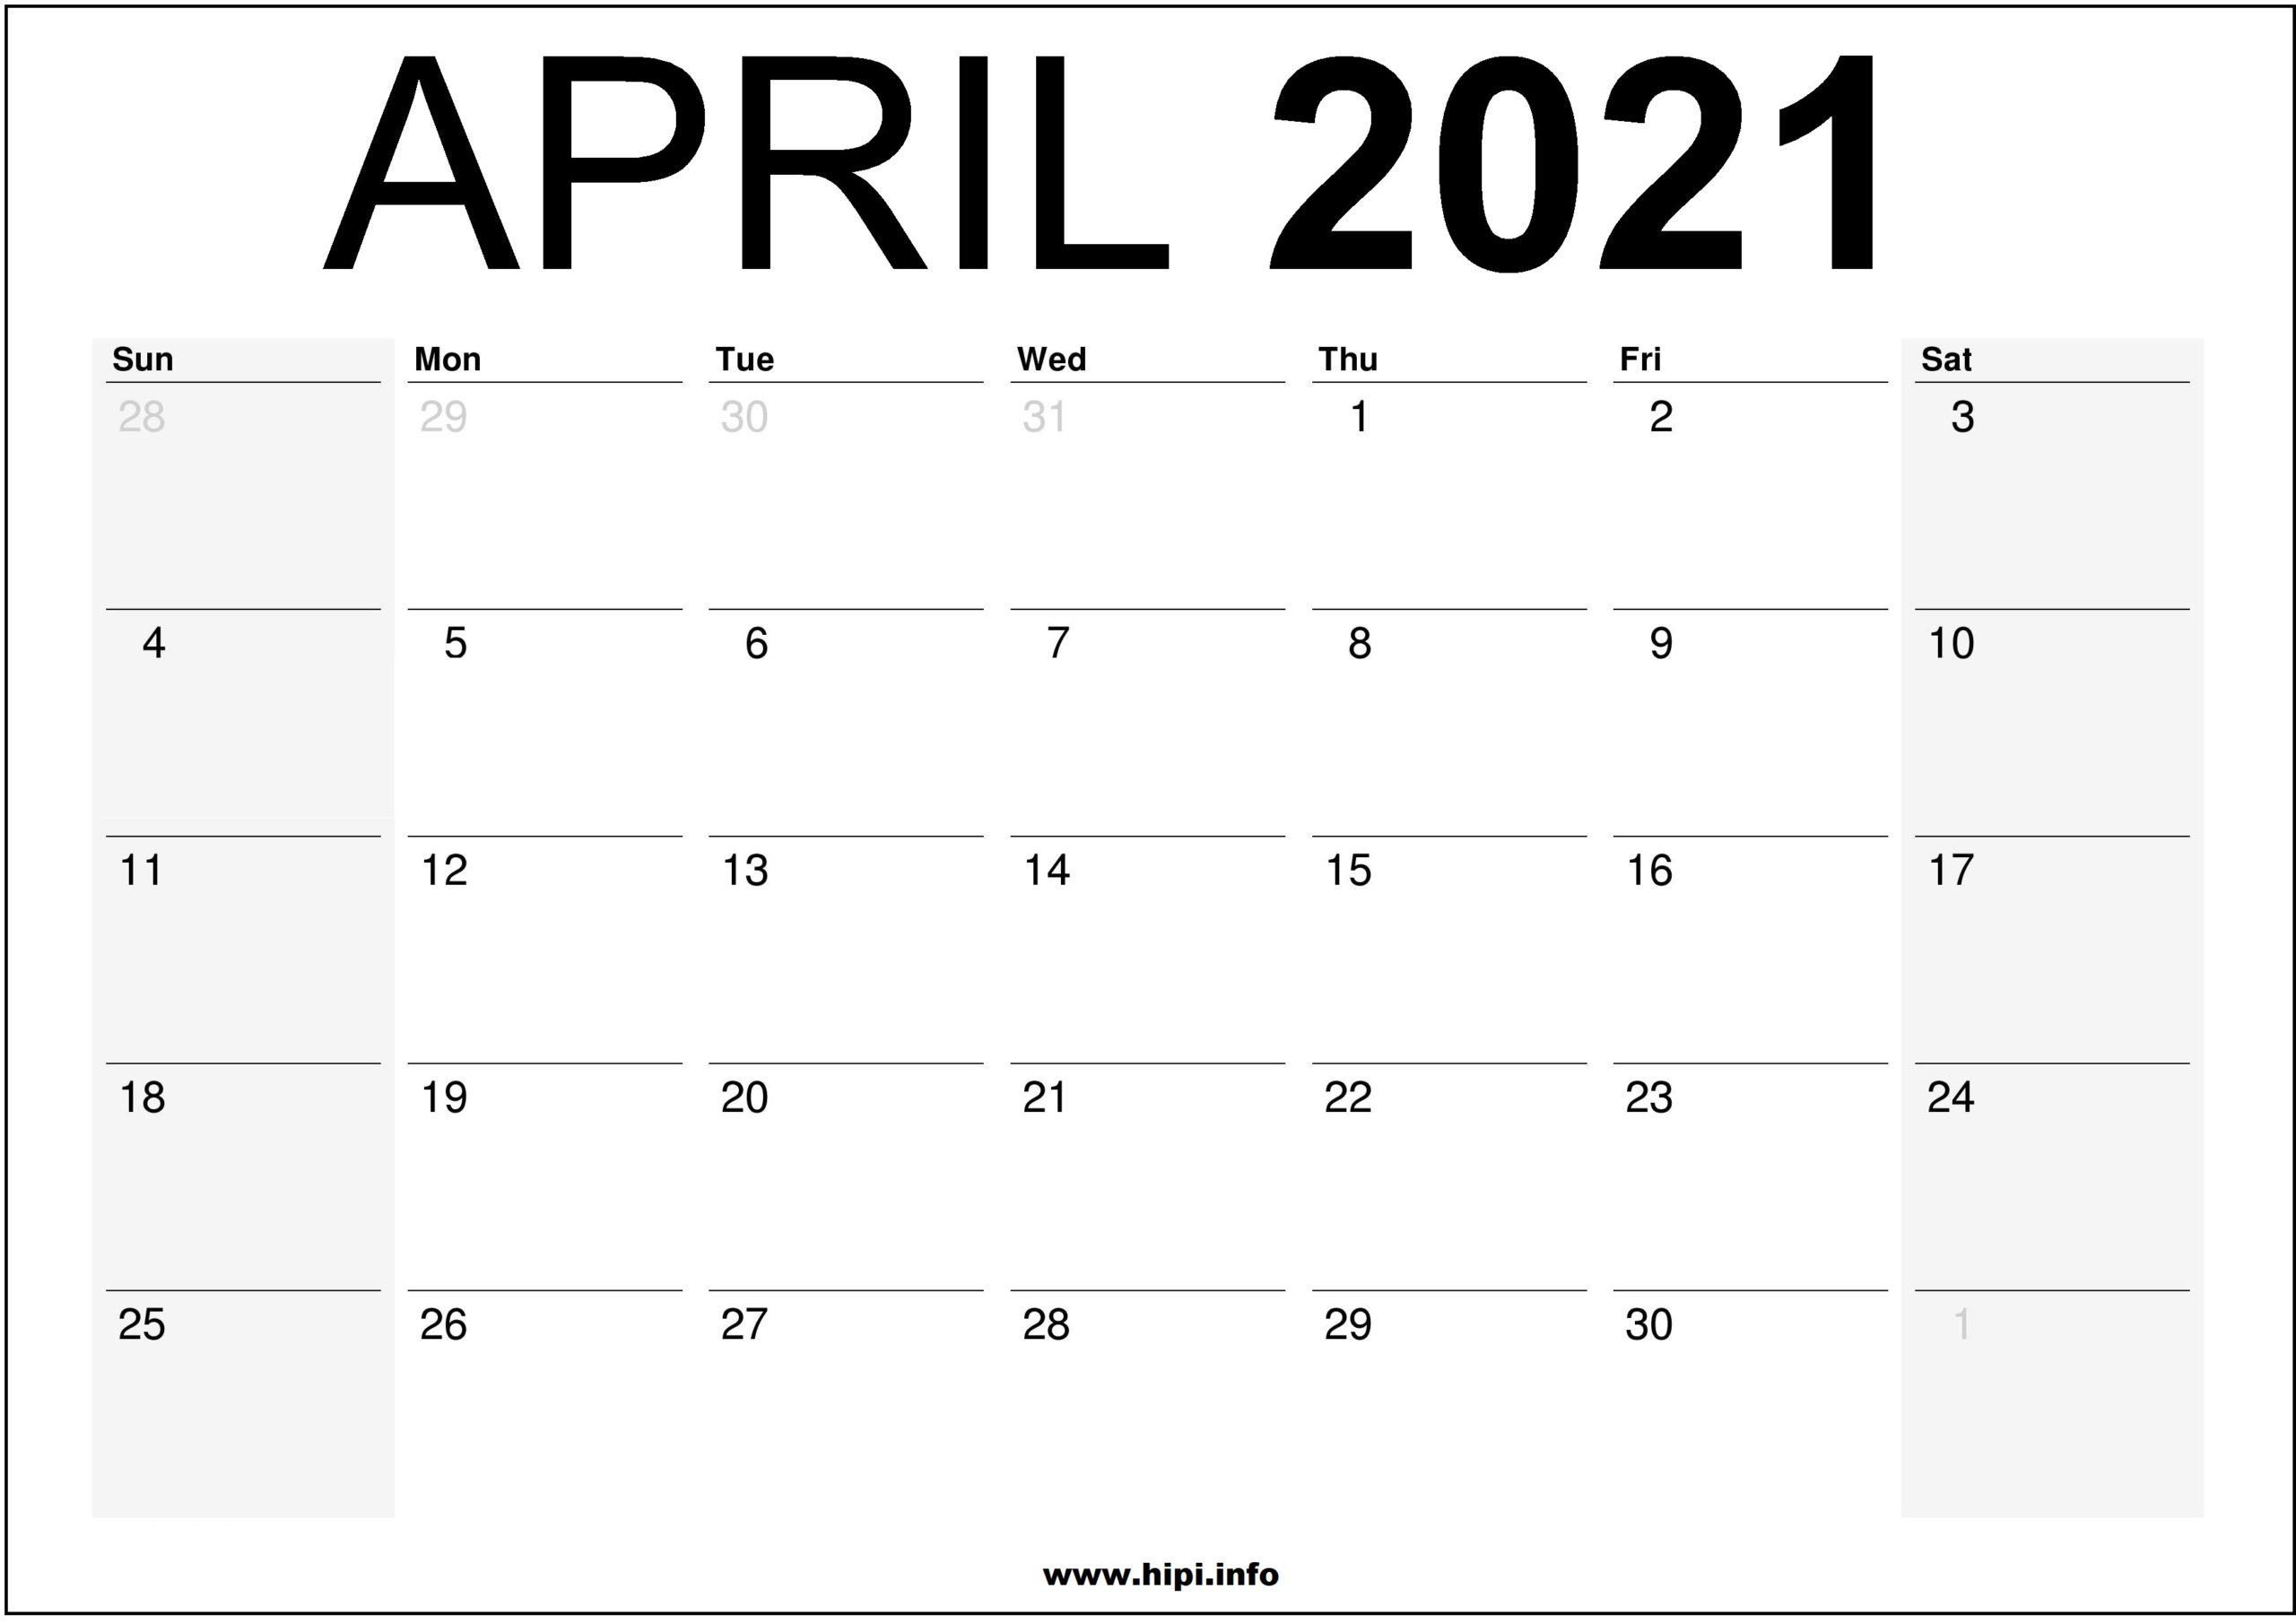 April 2021 Calendar Printable - Monthly Calendar Free ...